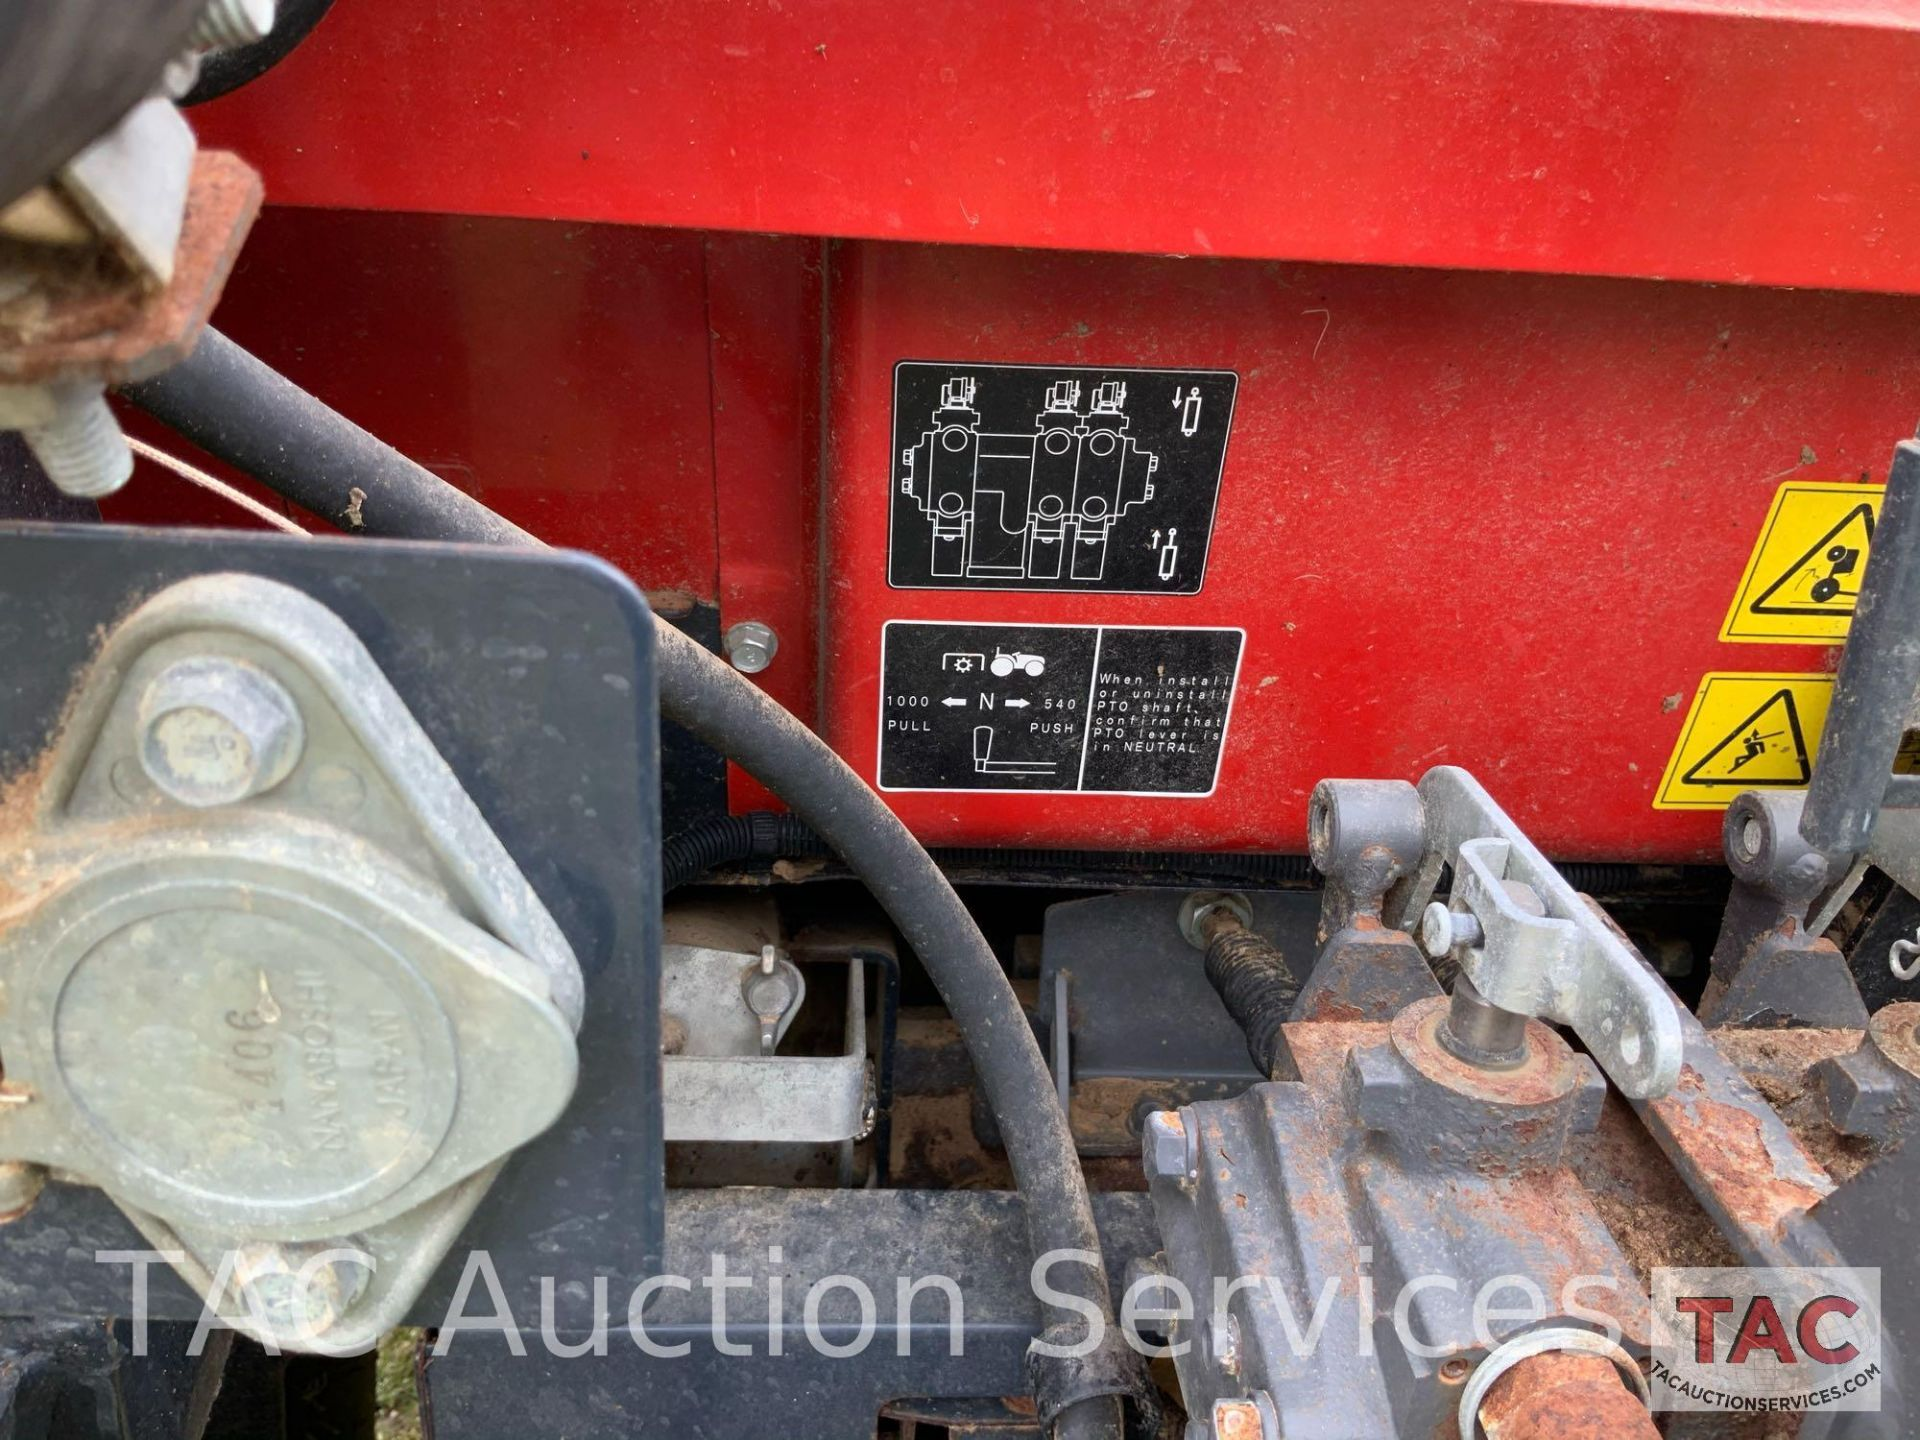 Massey-Ferguson 4610LP Farm Tractor - Image 22 of 26